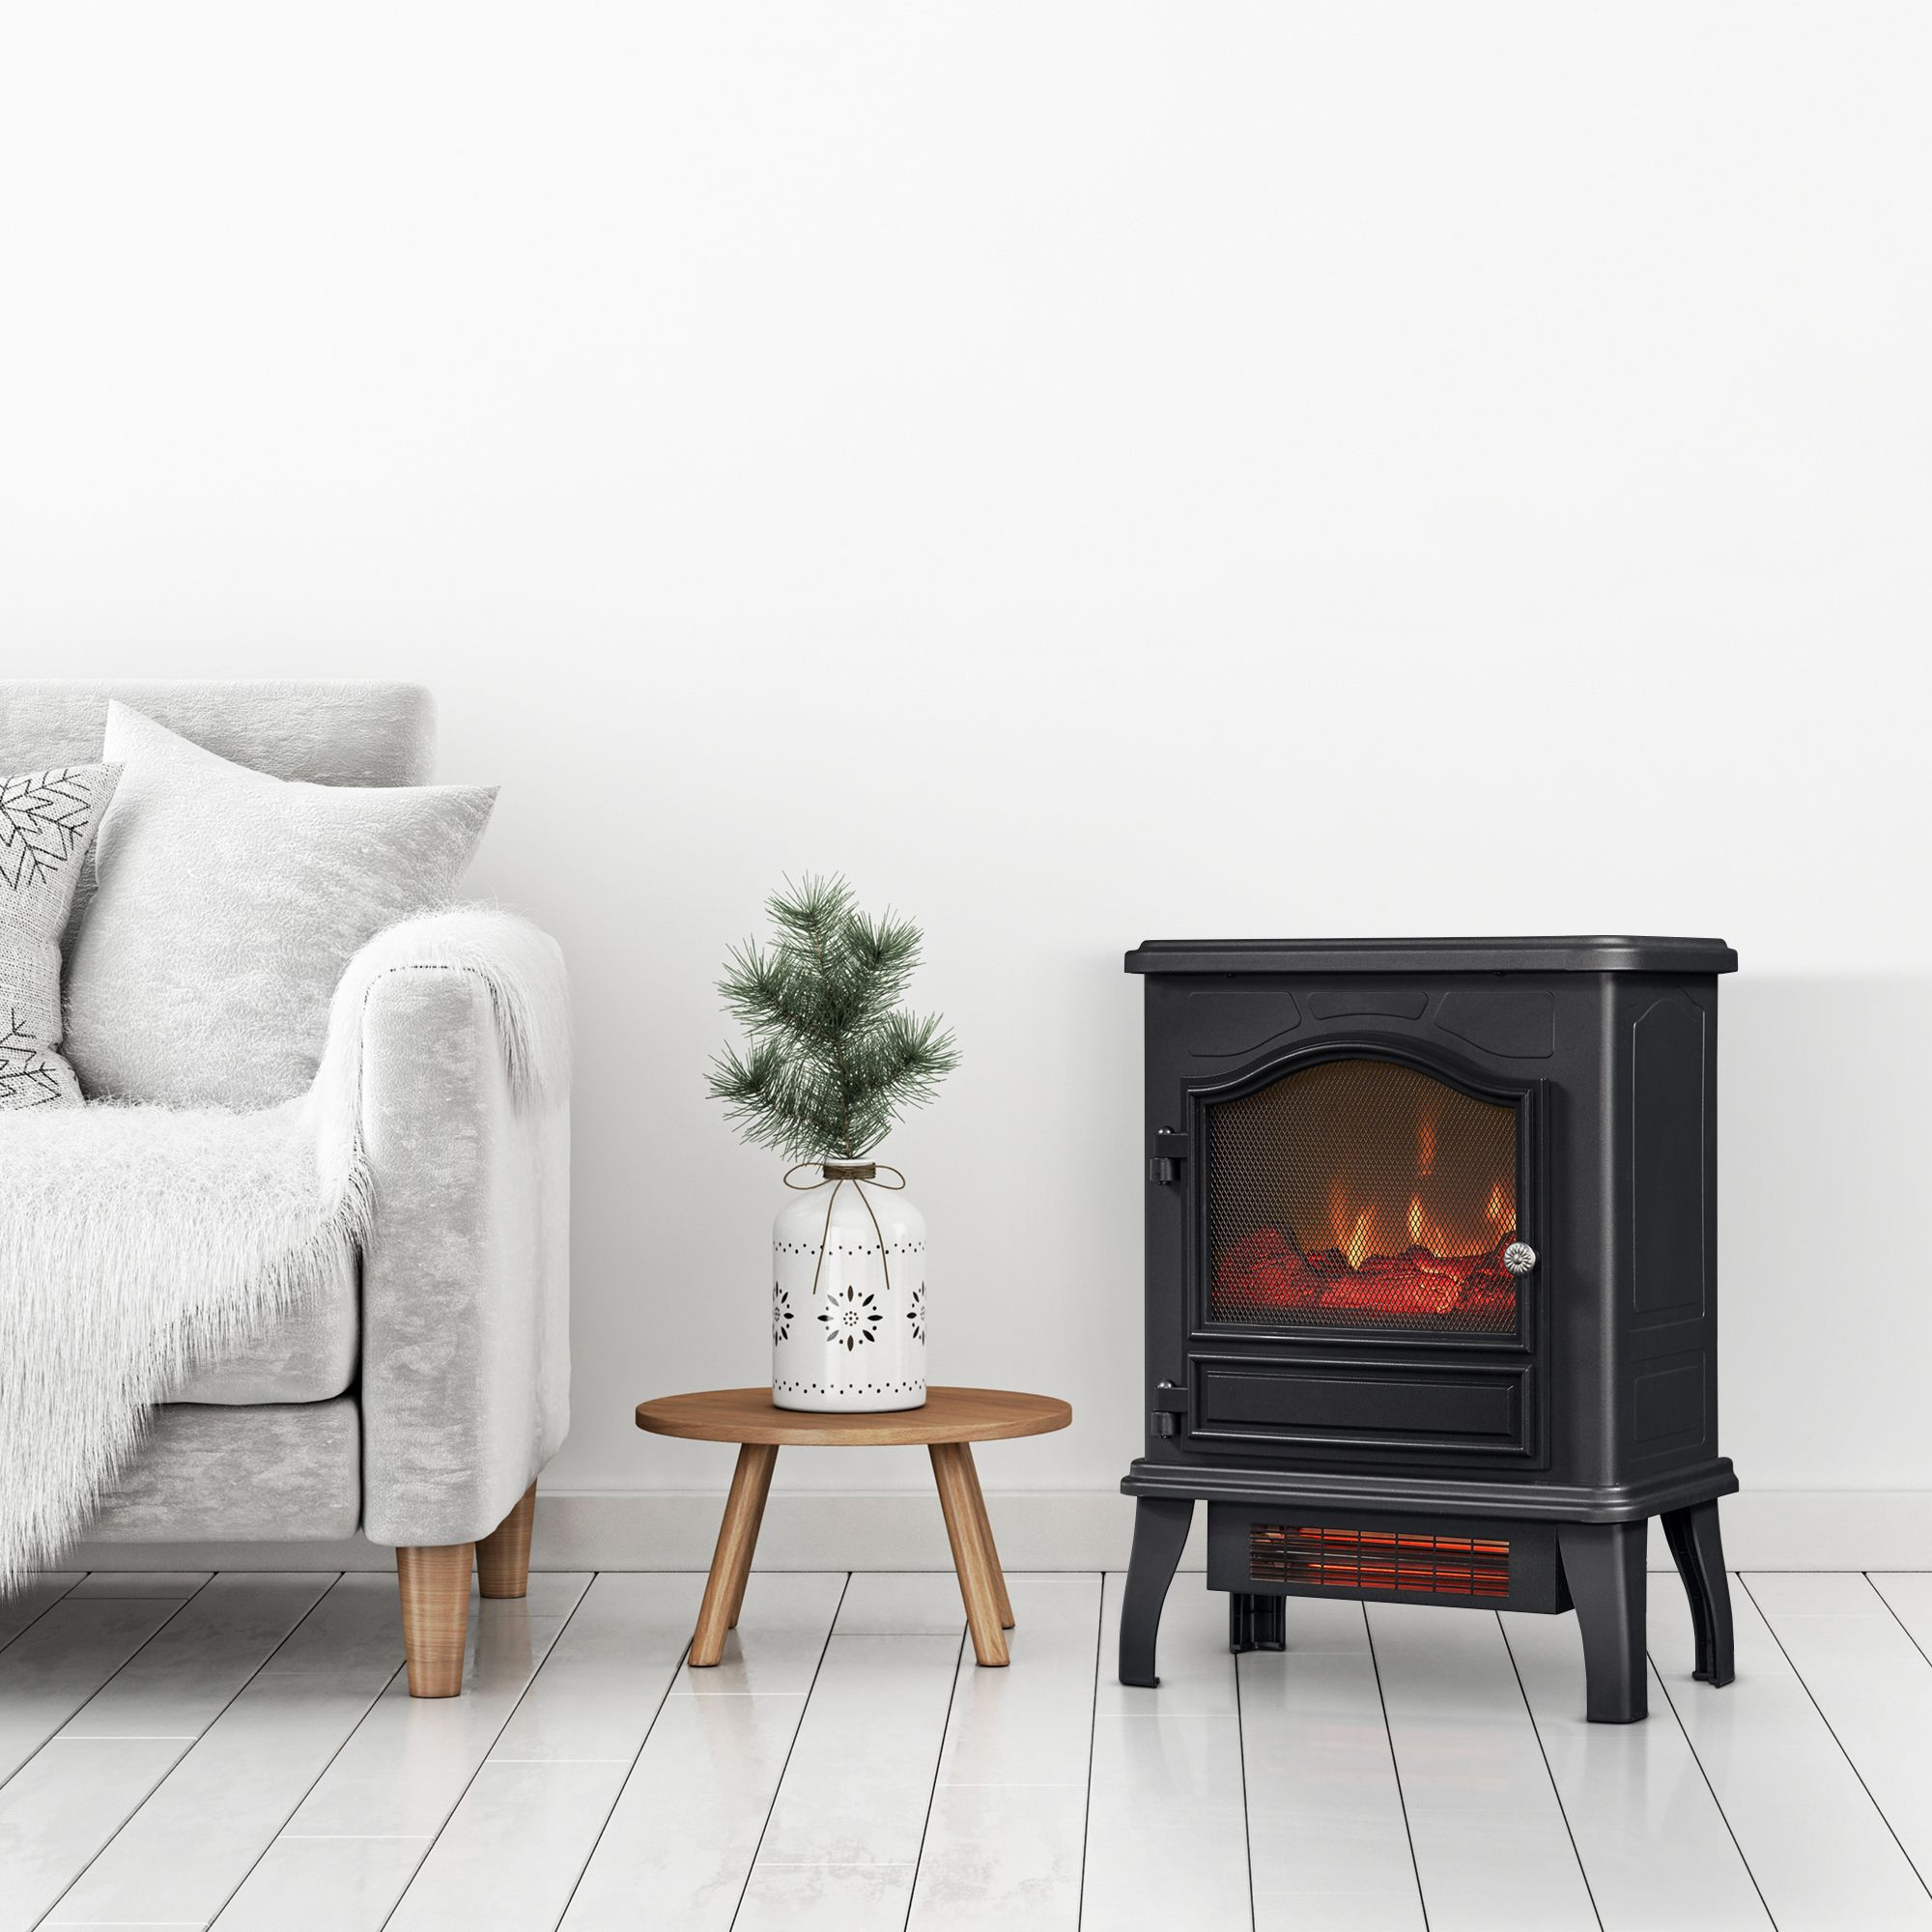 ChimneyFree Infrared Quartz Electric Stove Heater - Walmart.com - Walmart.com